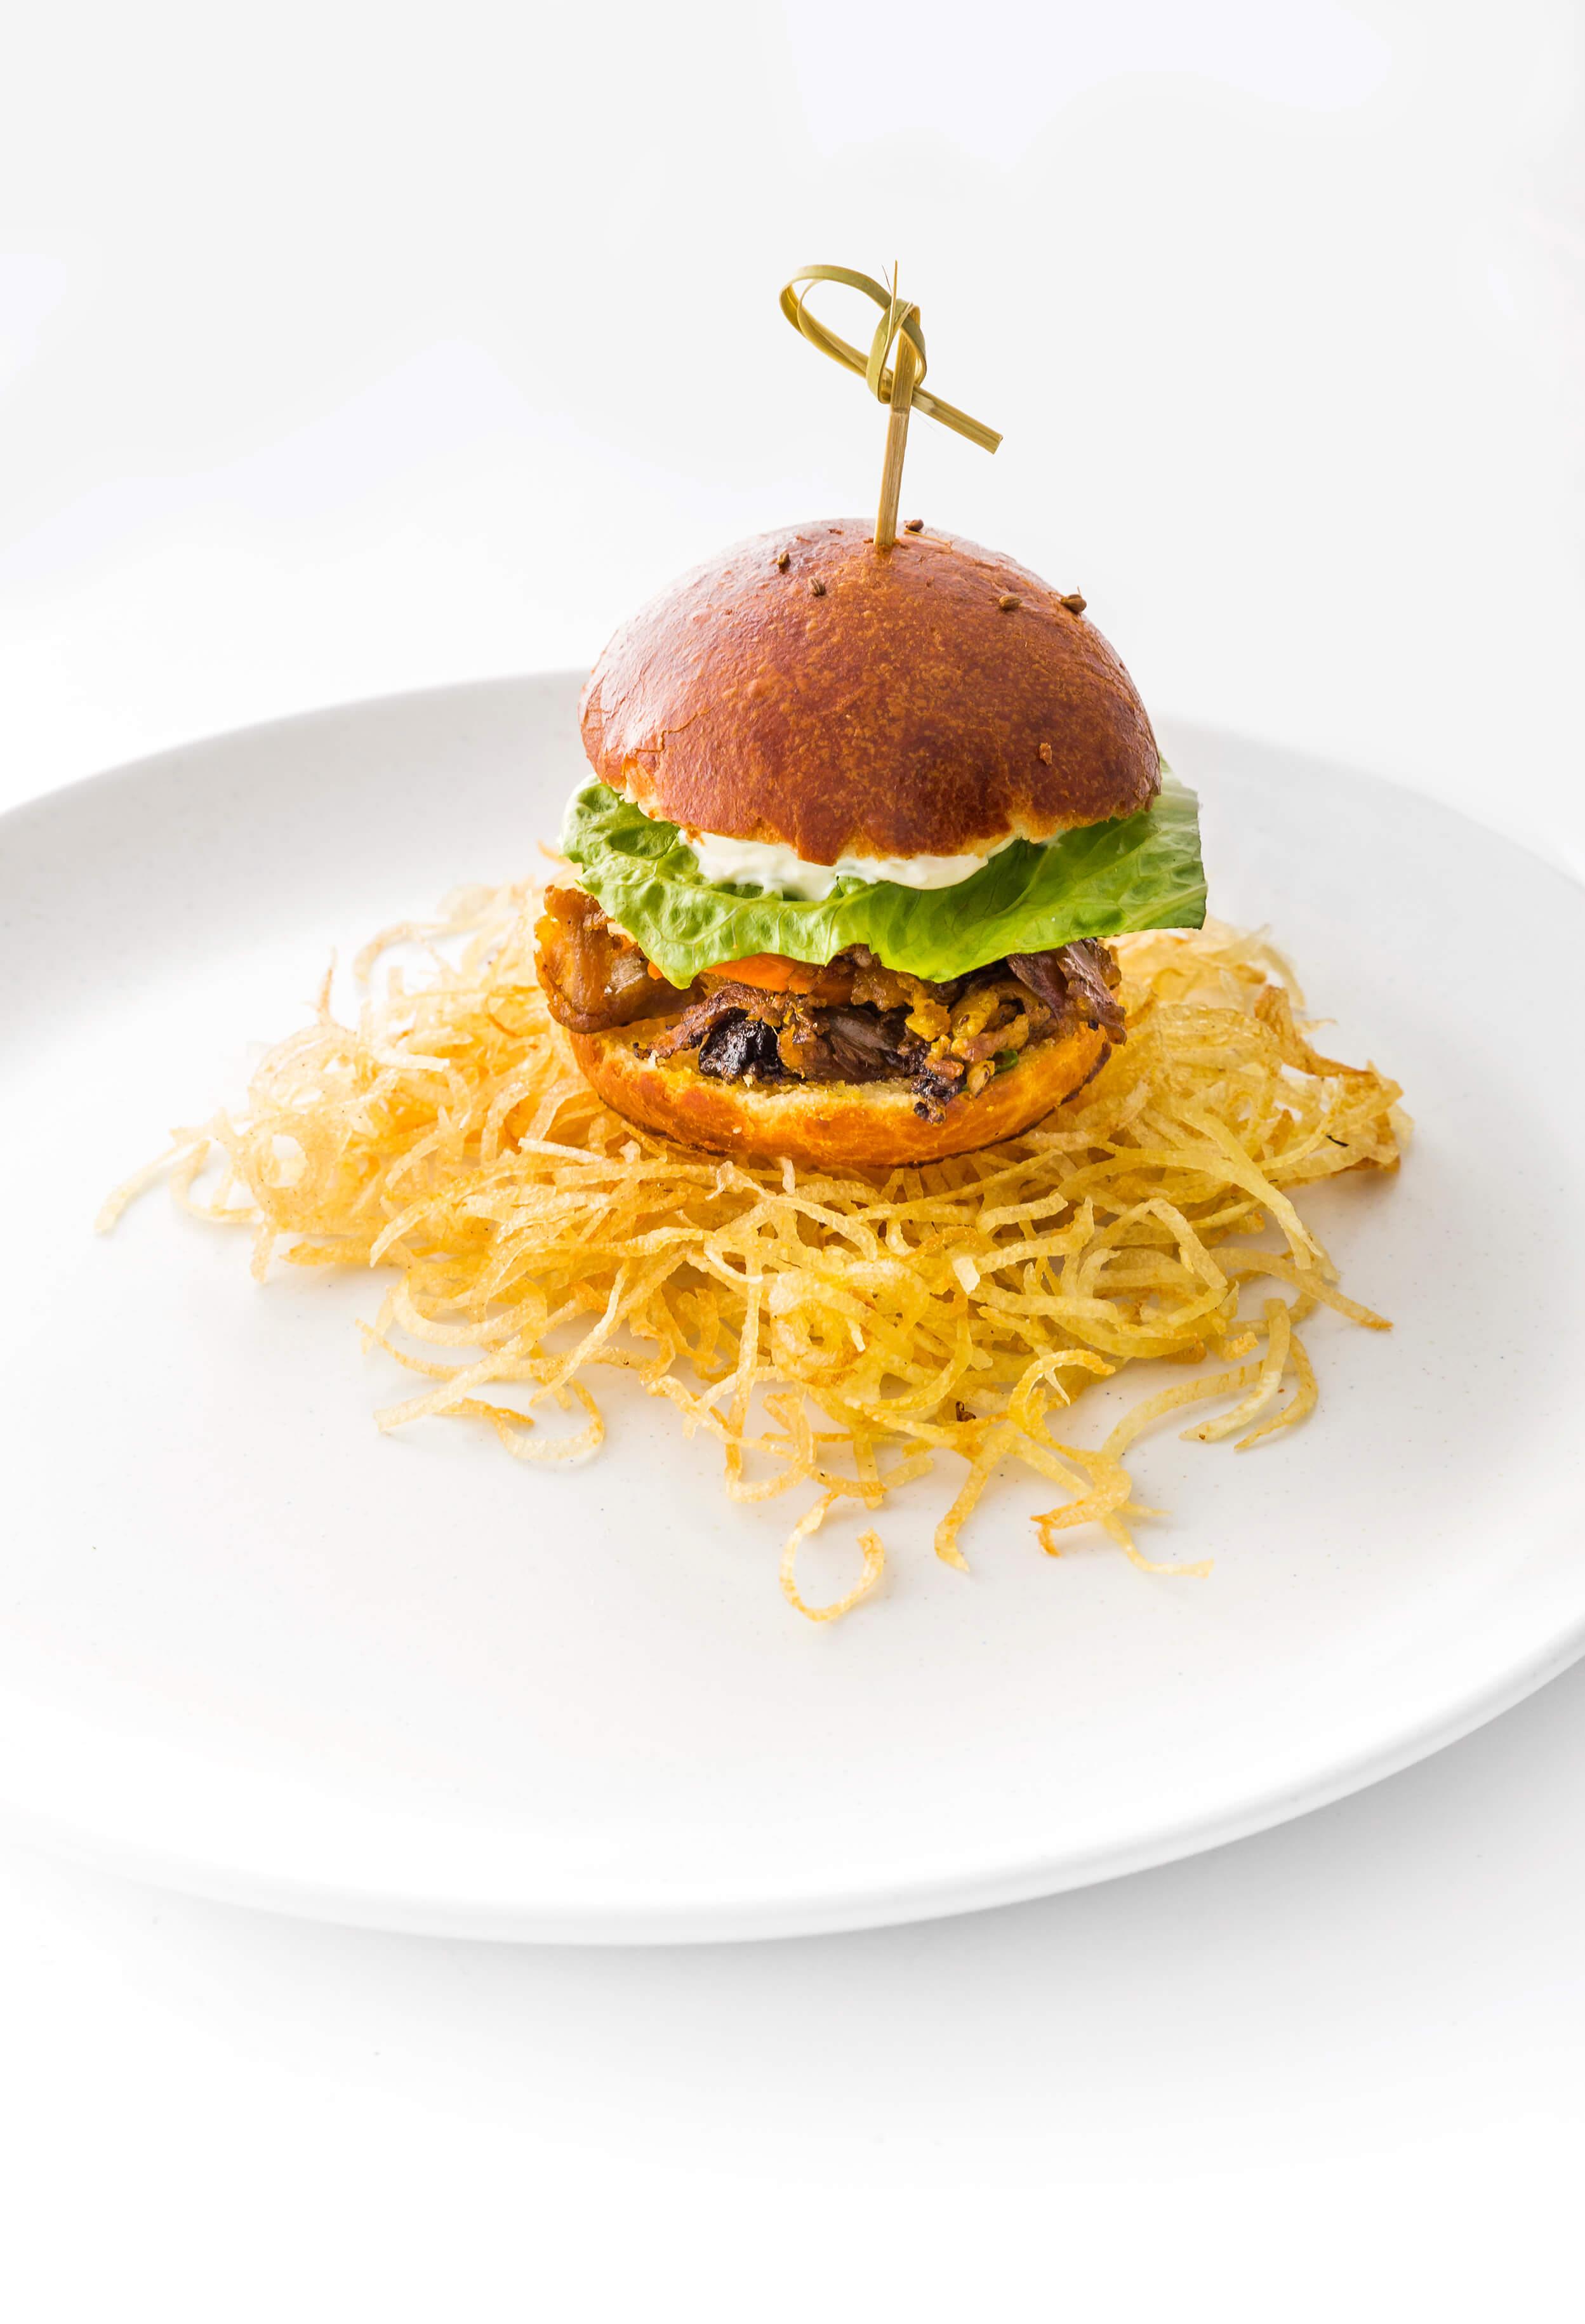 Top 5 Ways To Brunch In London This Weekend Bernardi Burger Two Go Beef Lima Floral Andean Breakfast Suckling Pig Brioche Bun